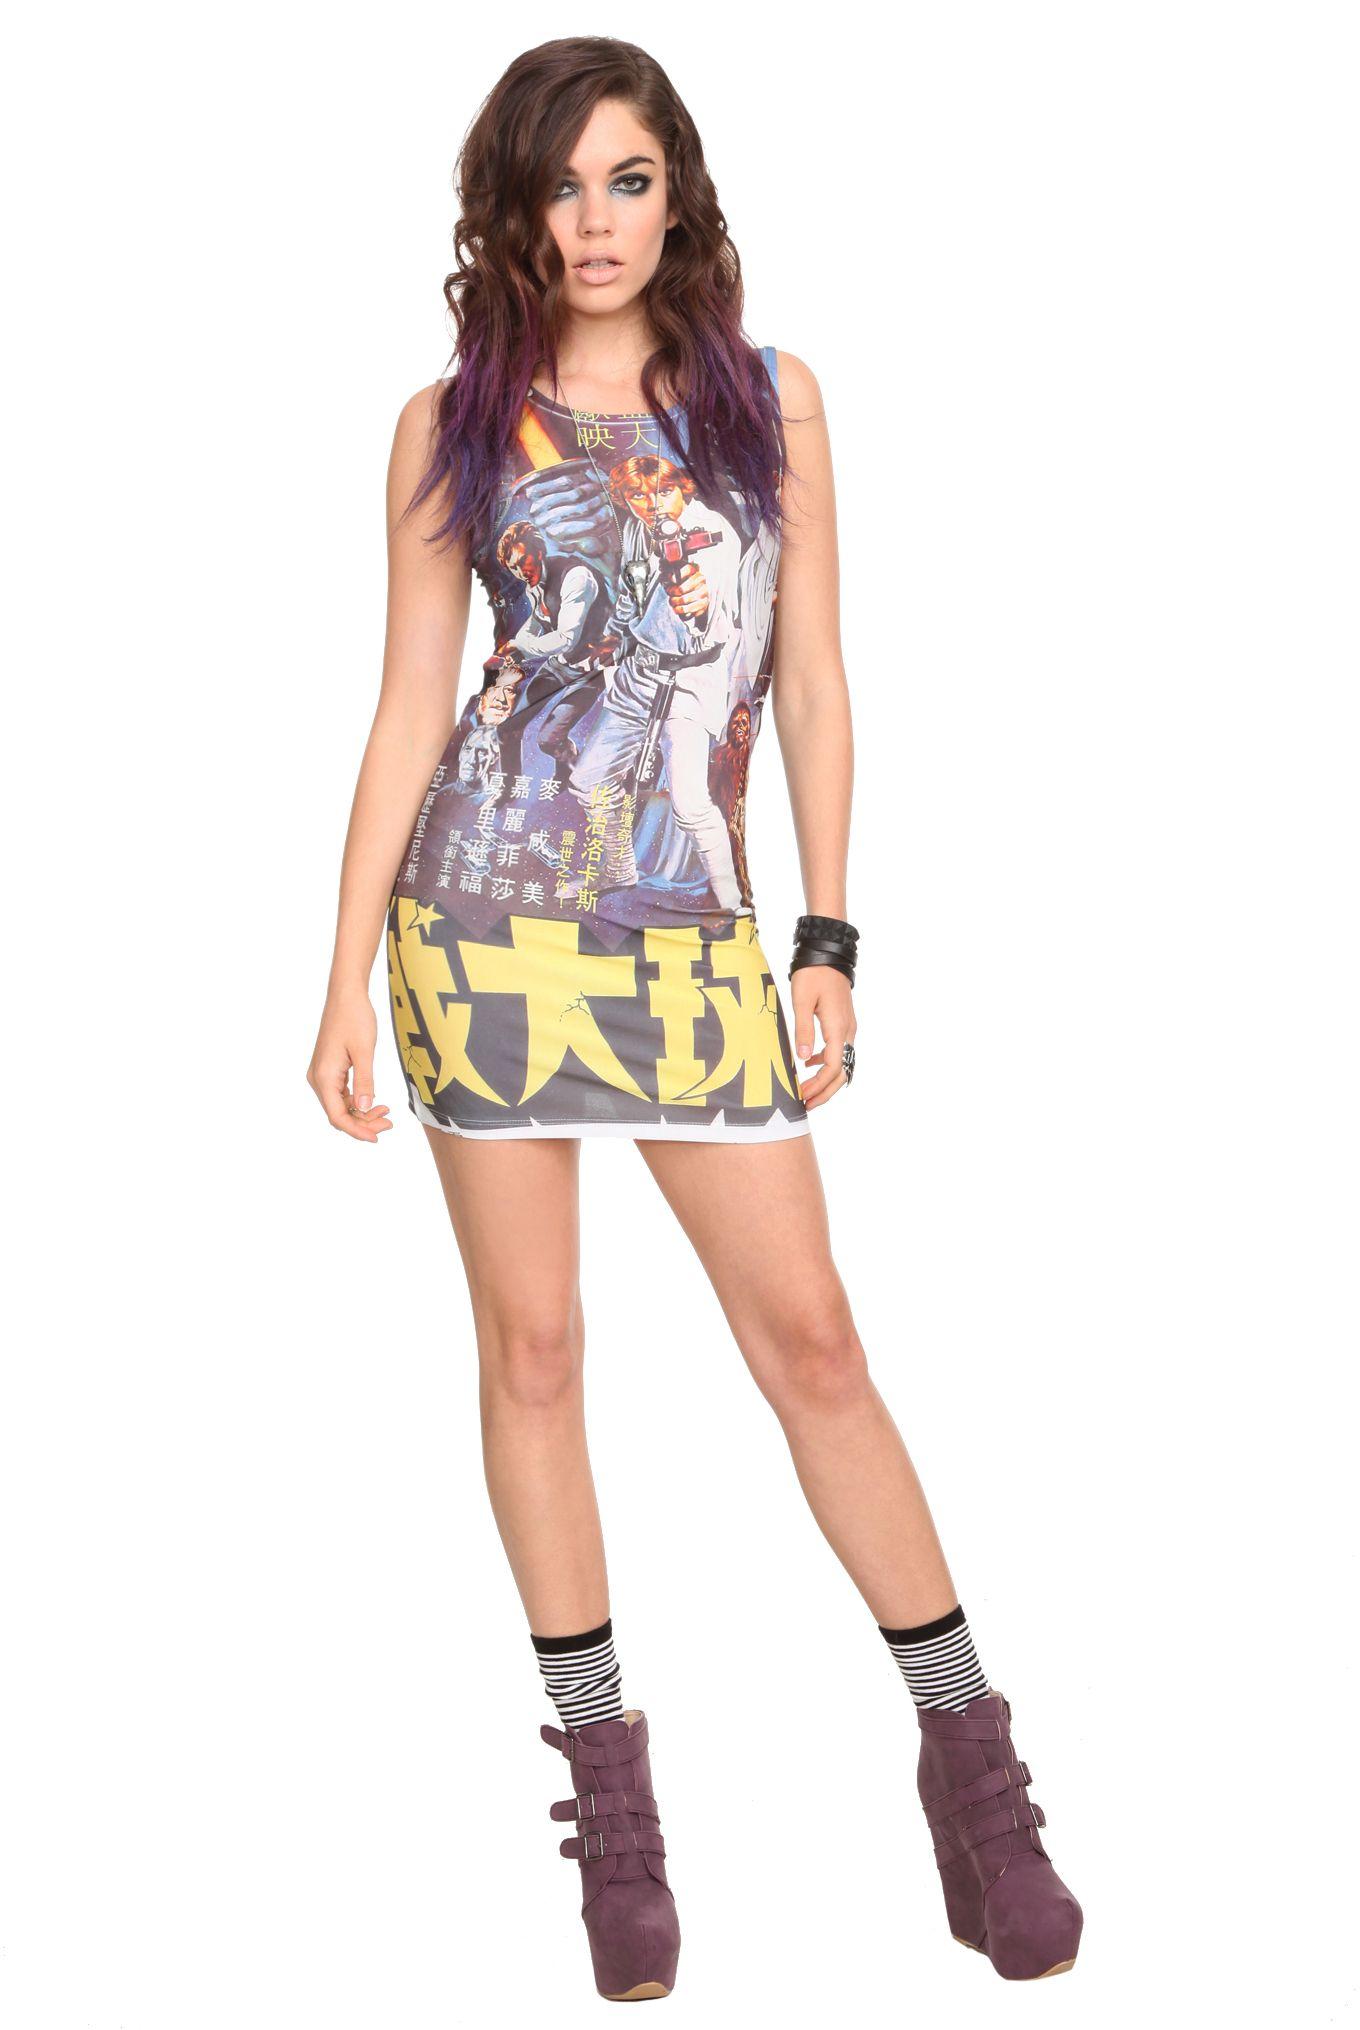 hot topic exclusive star wars dress my style star wars dresses rh pinterest co uk